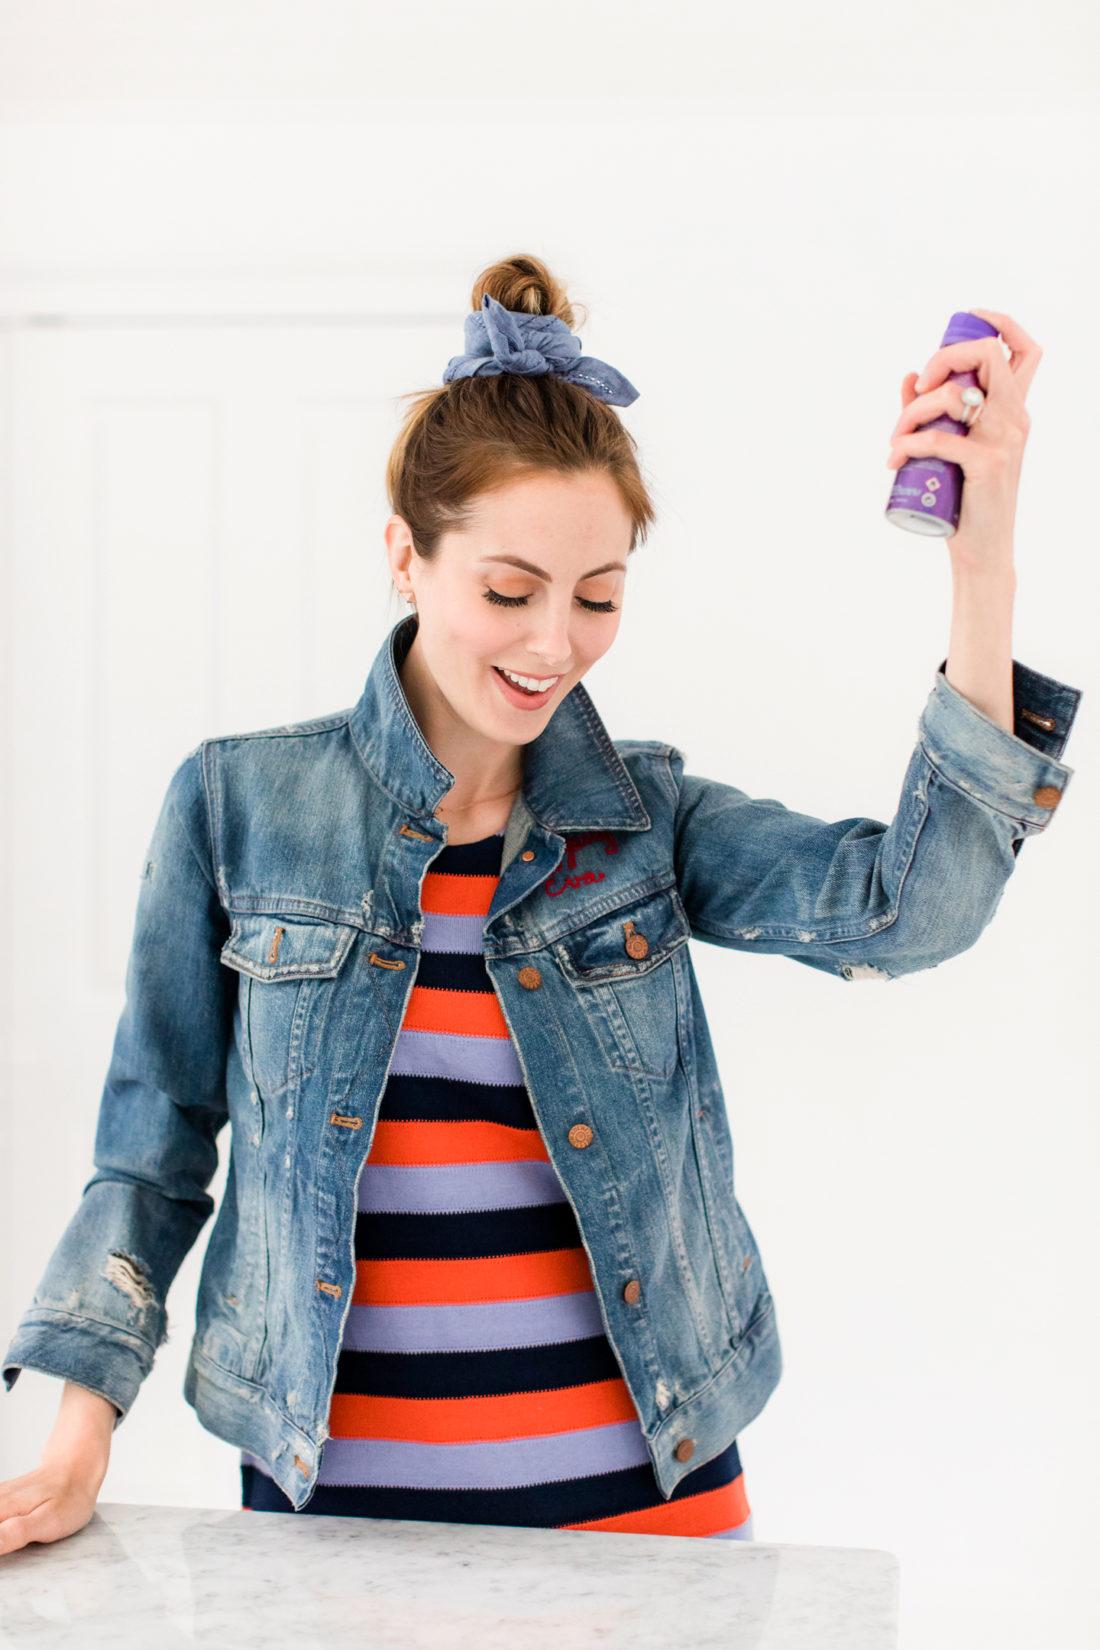 Eva Amurri Martino sprays her kerchief bun hairstyle with felxible hold hairspray